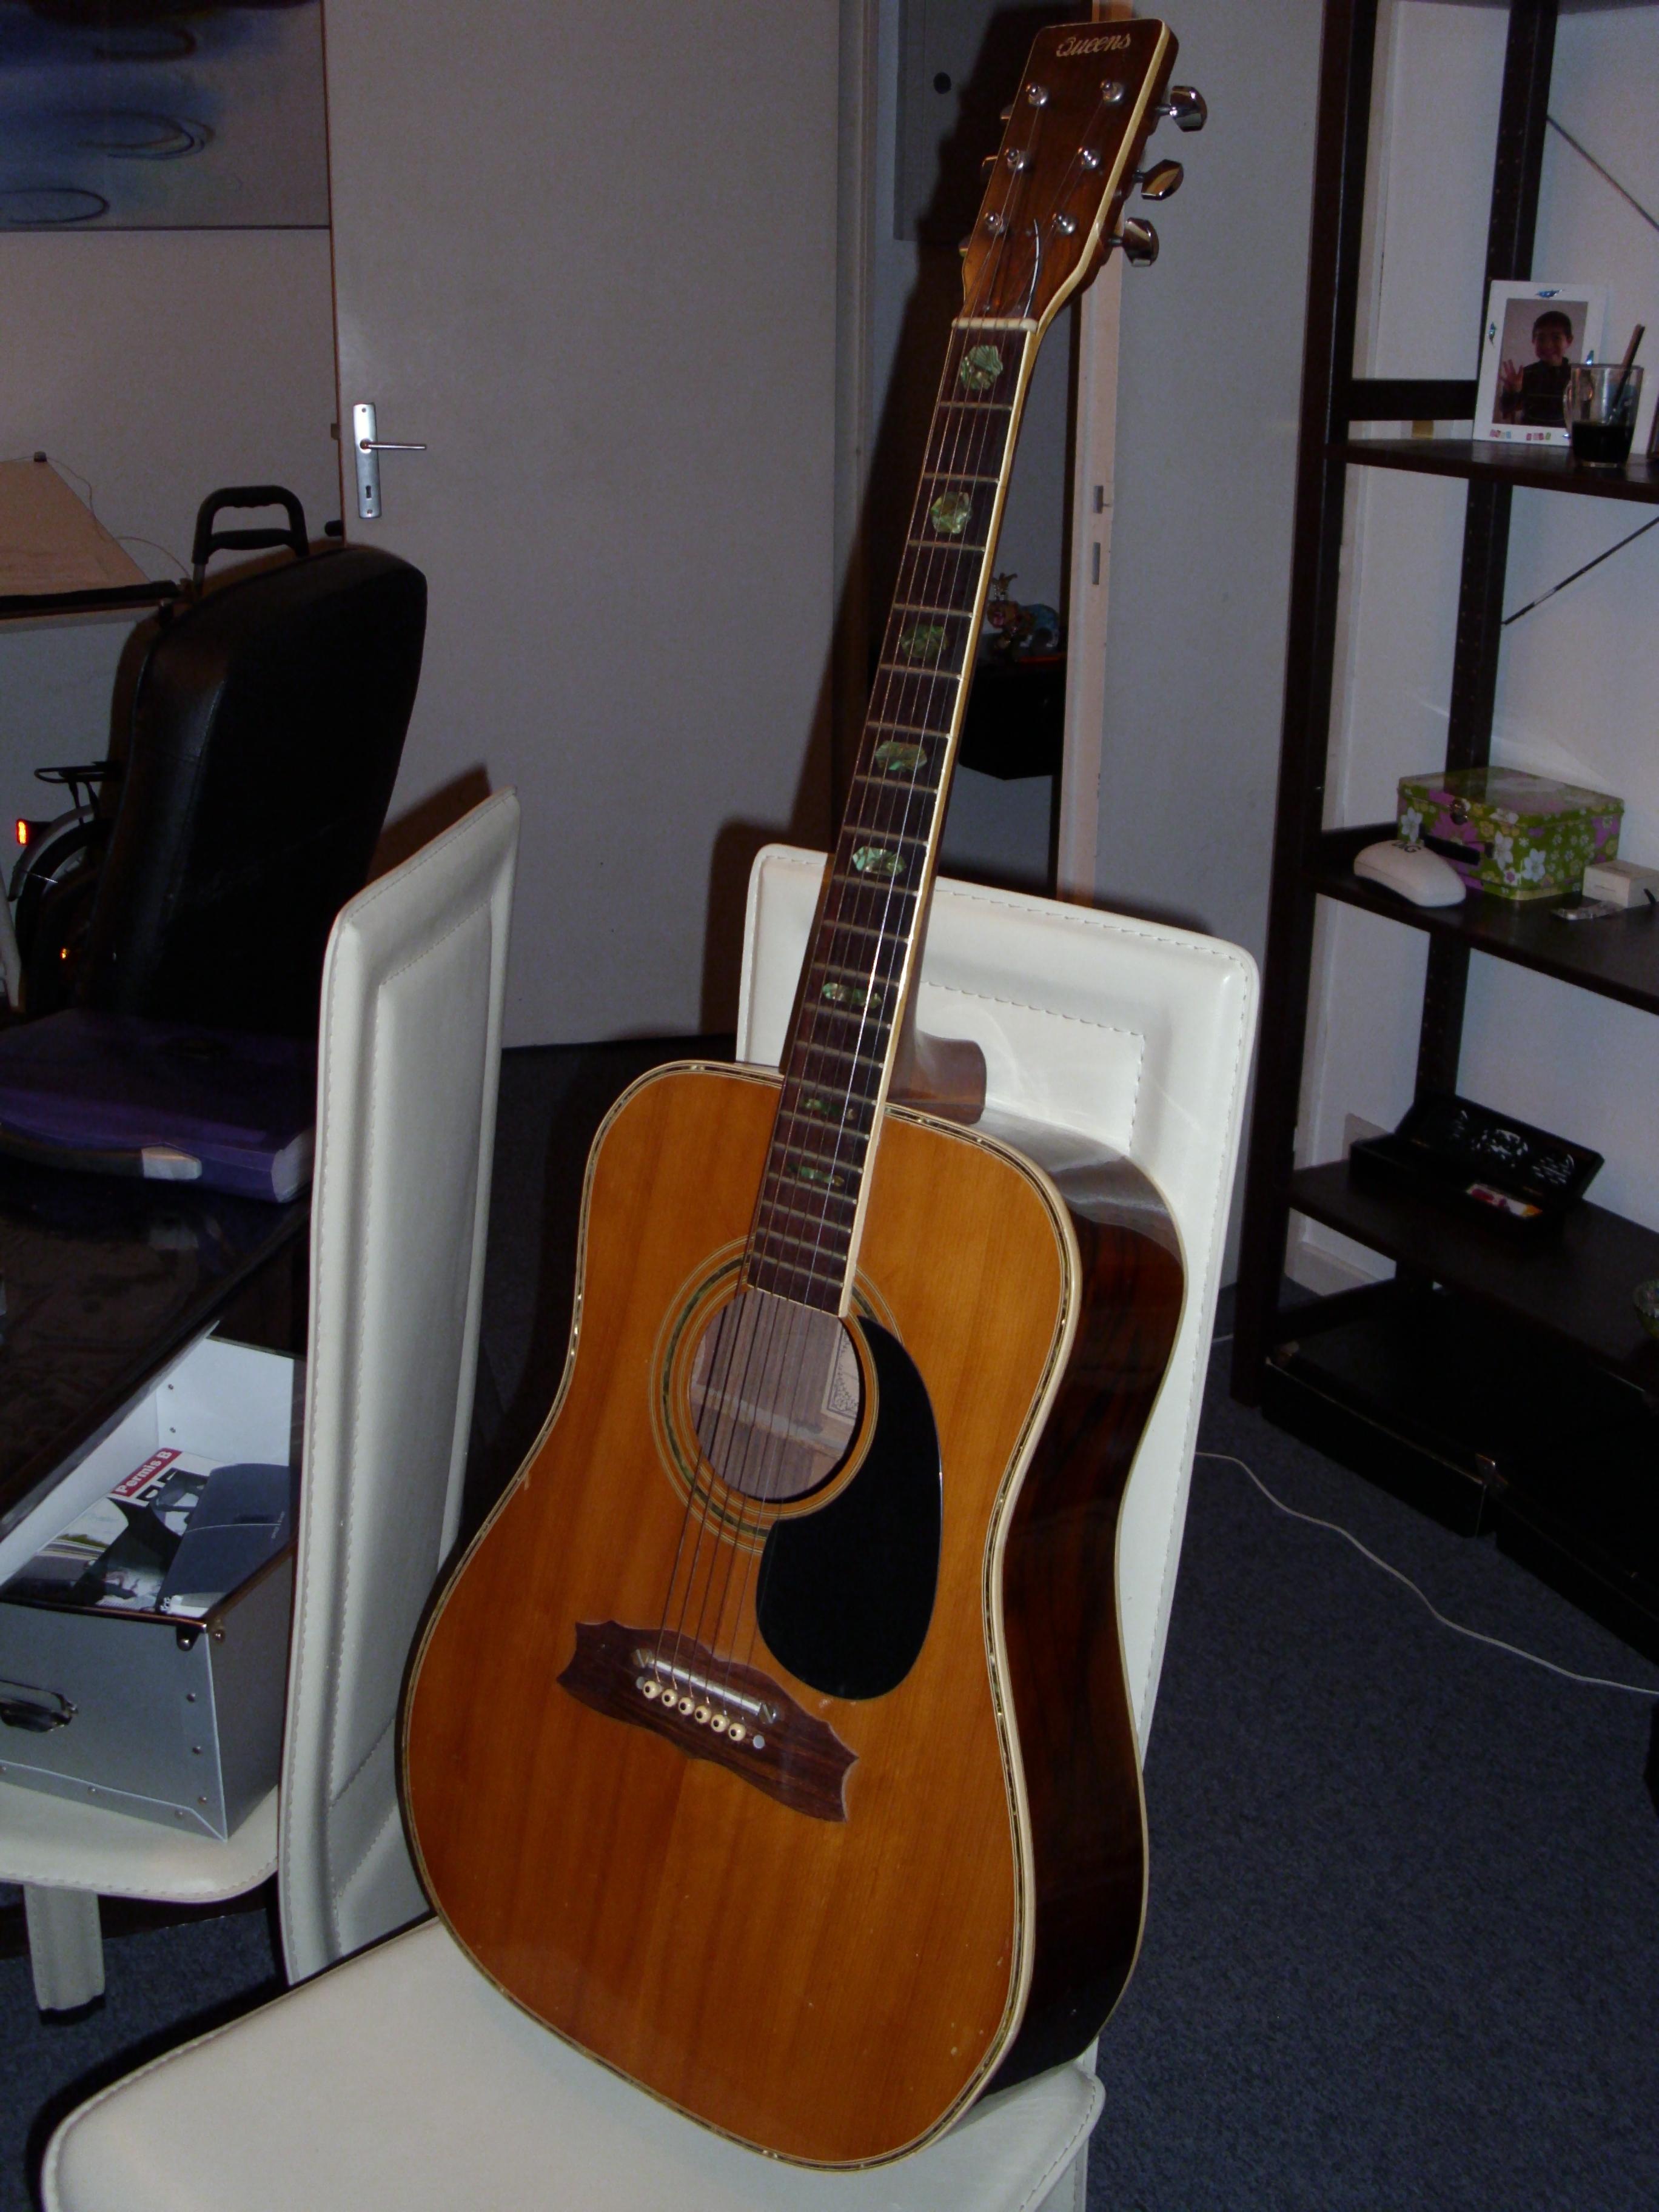 guitare acoustique queens